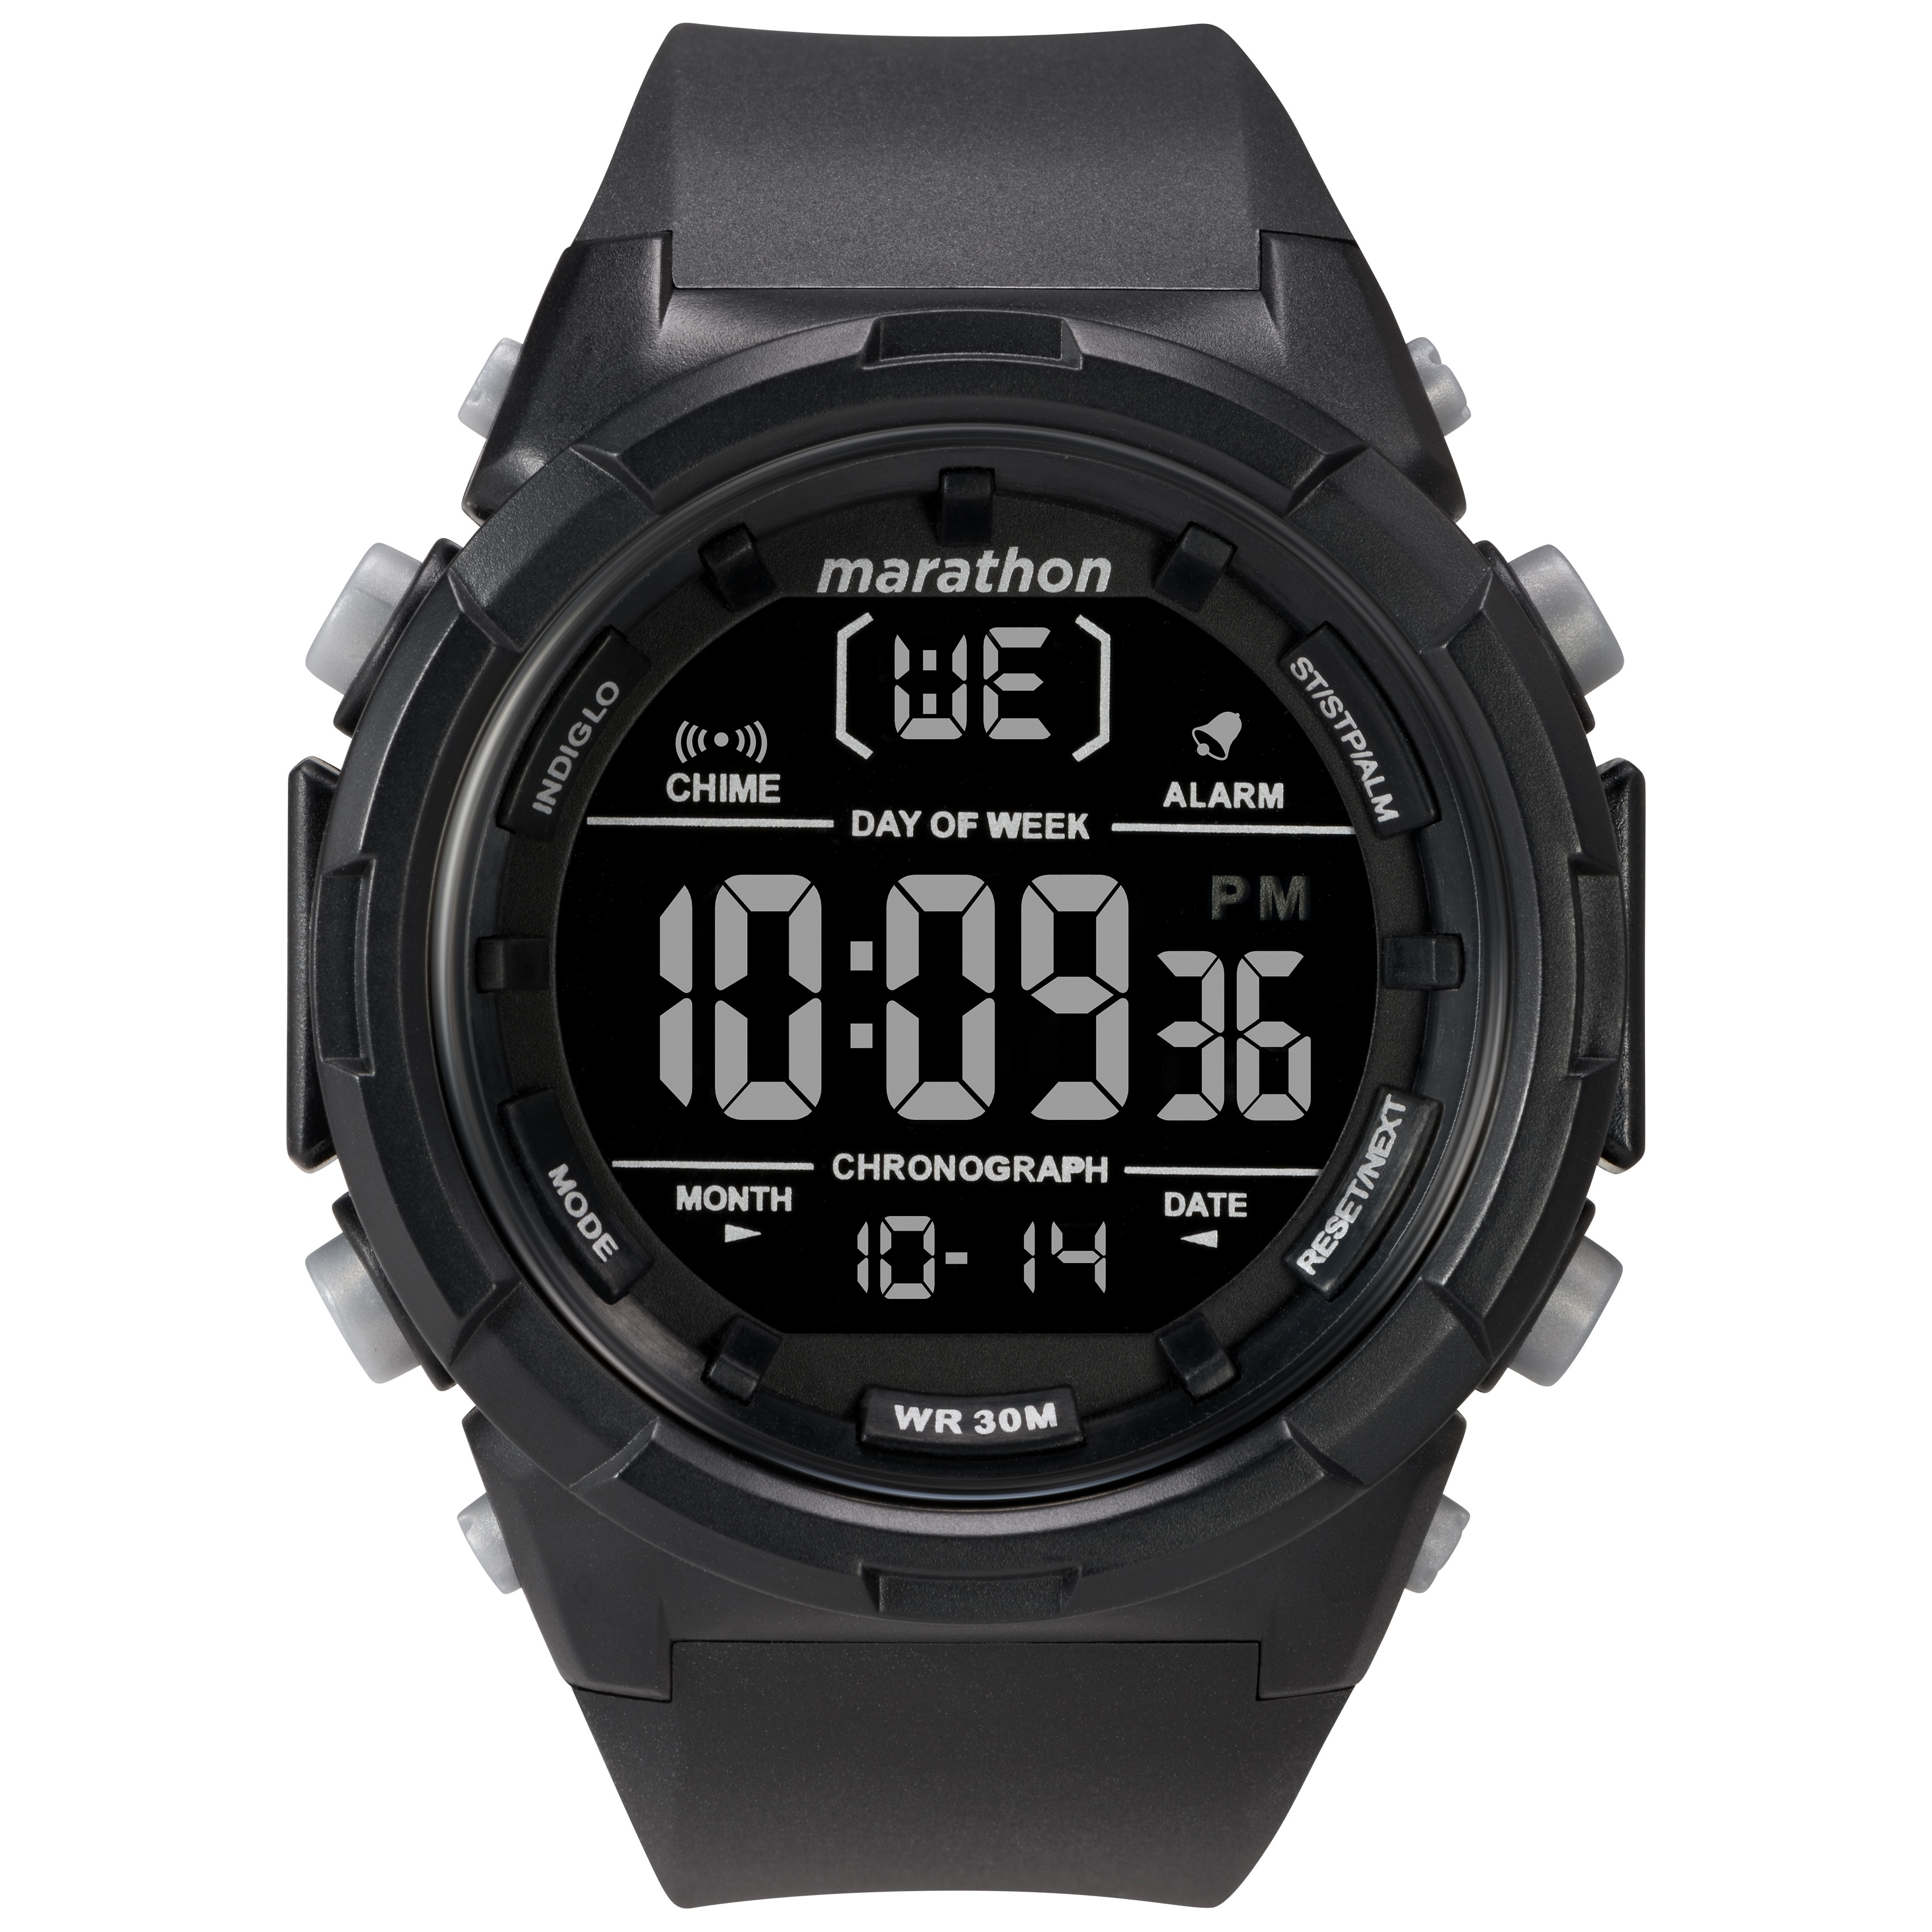 8b2d75341 Marathon by Timex Men s TW5M22300 Digital 50mm Black Negative Resin Strap  Watch - N A